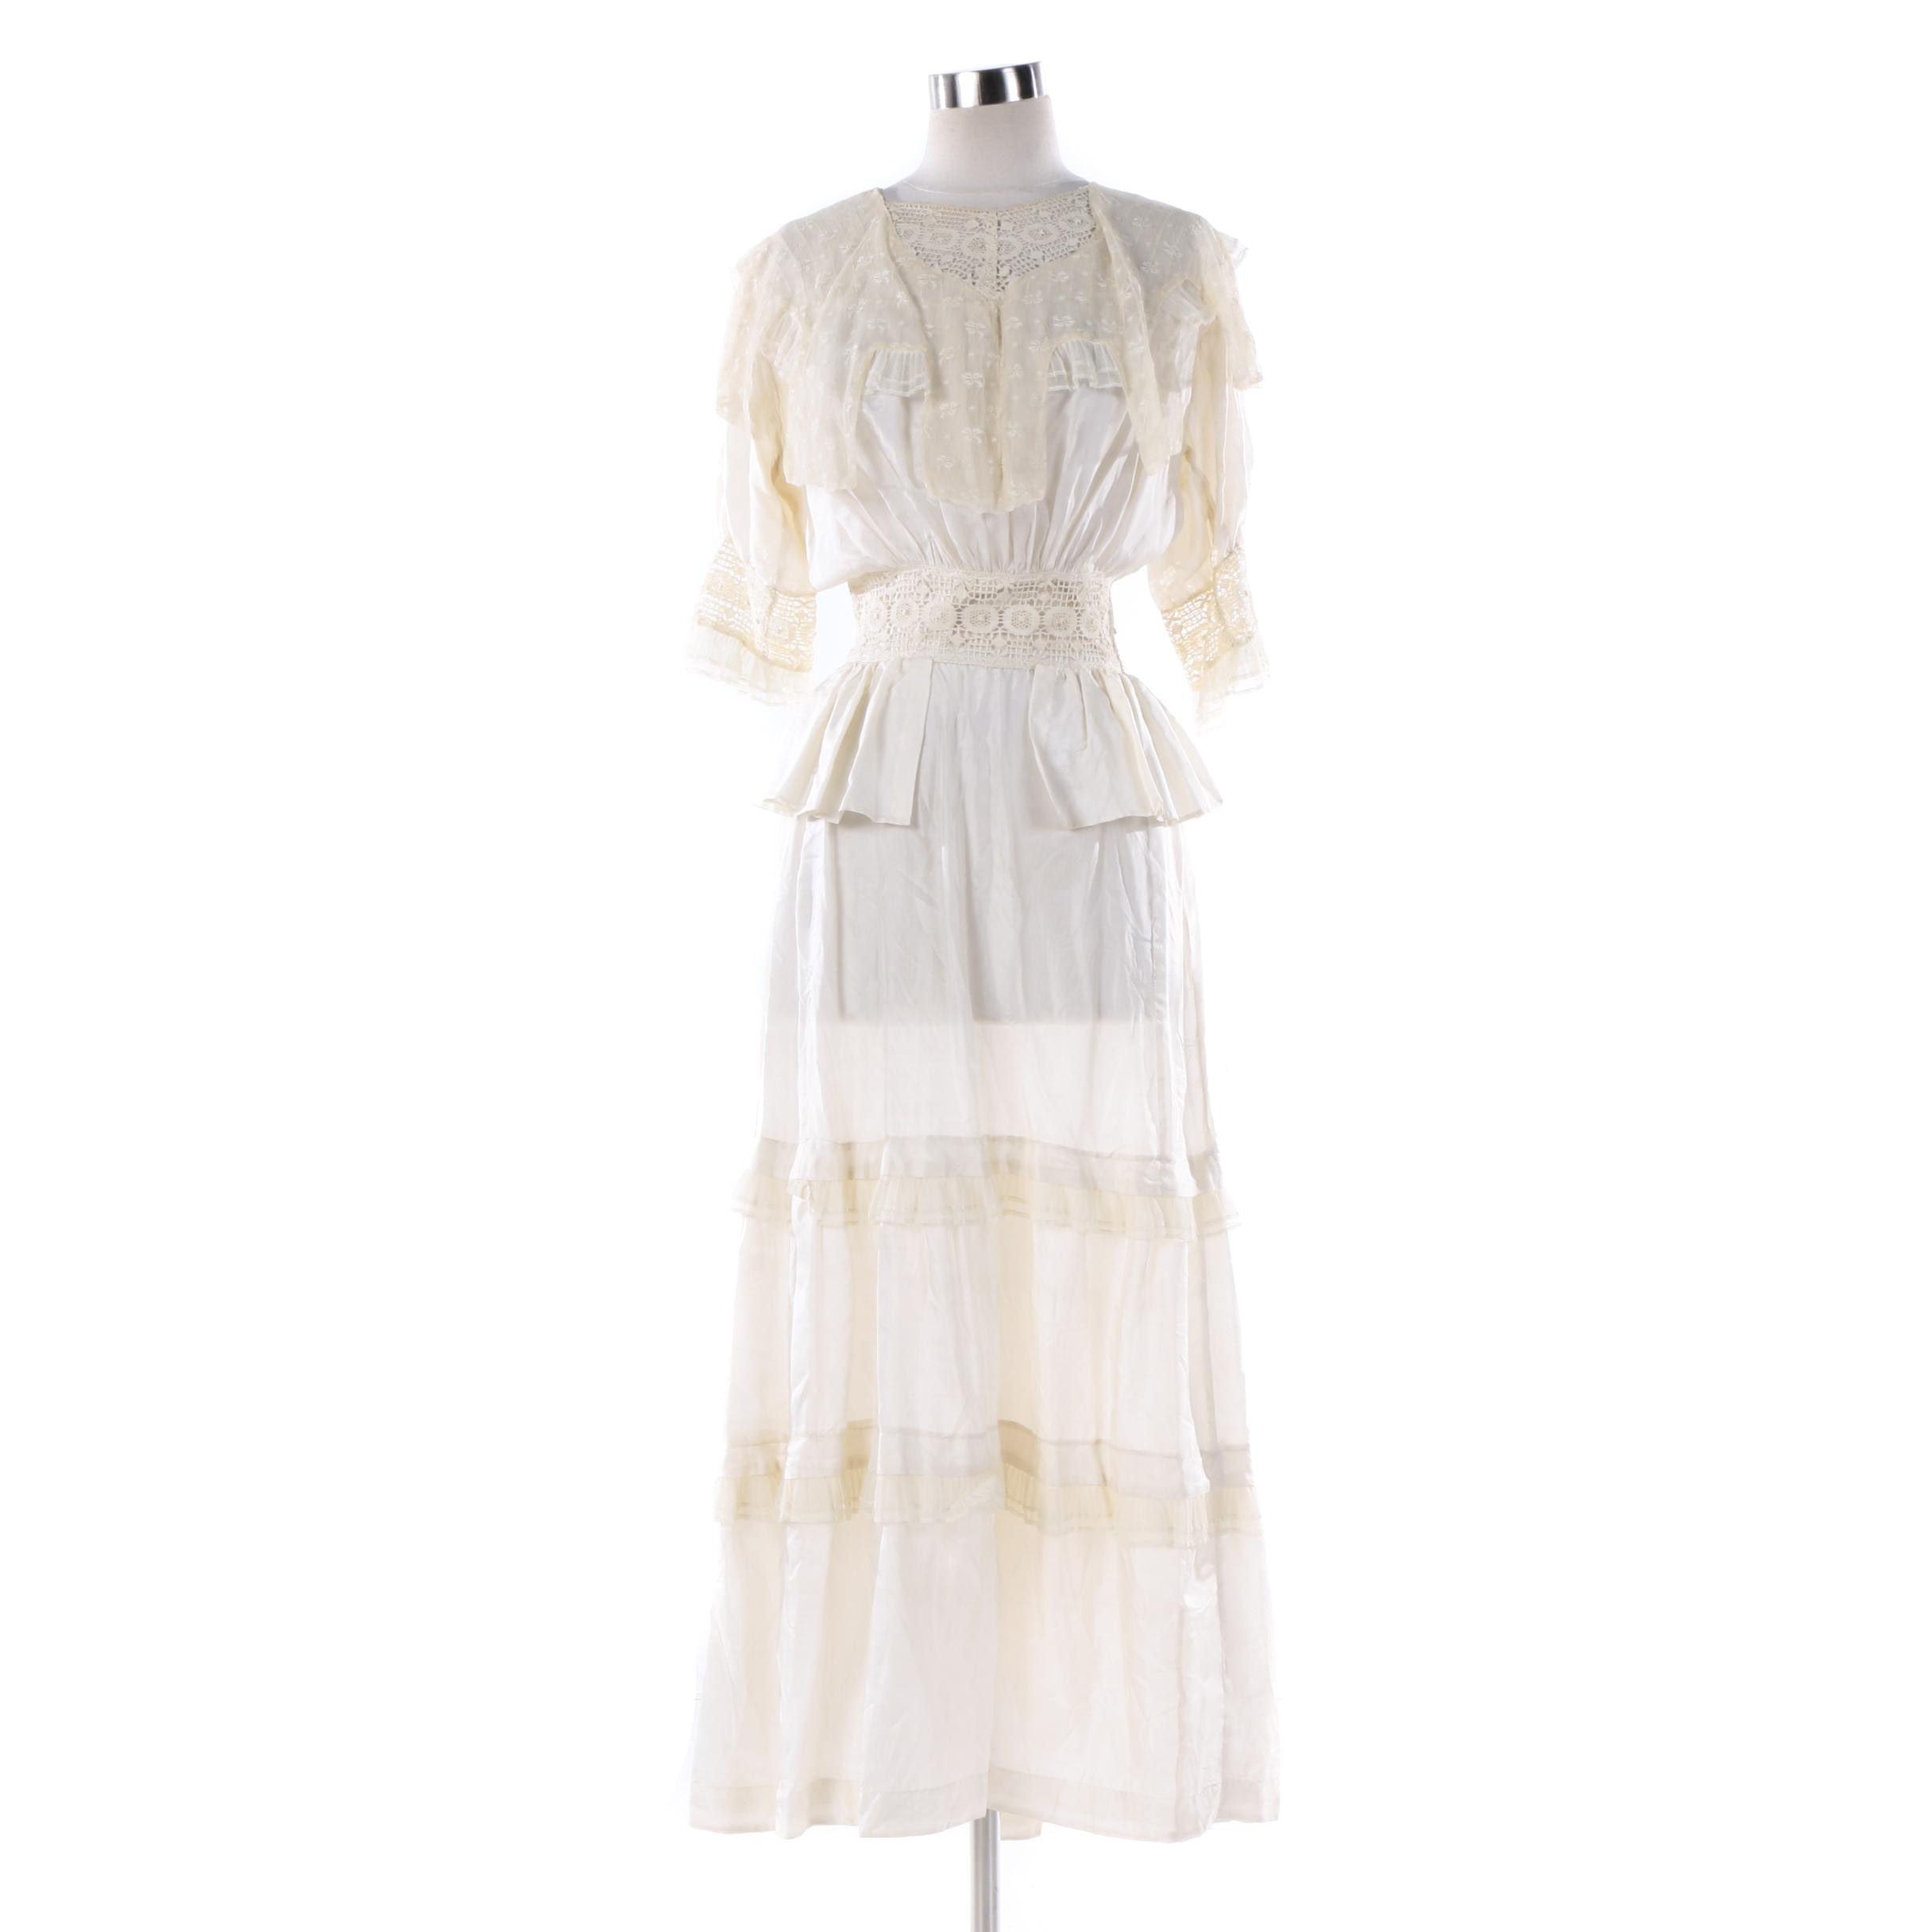 Vintage Silk Gauze and Crochet Lace Dress